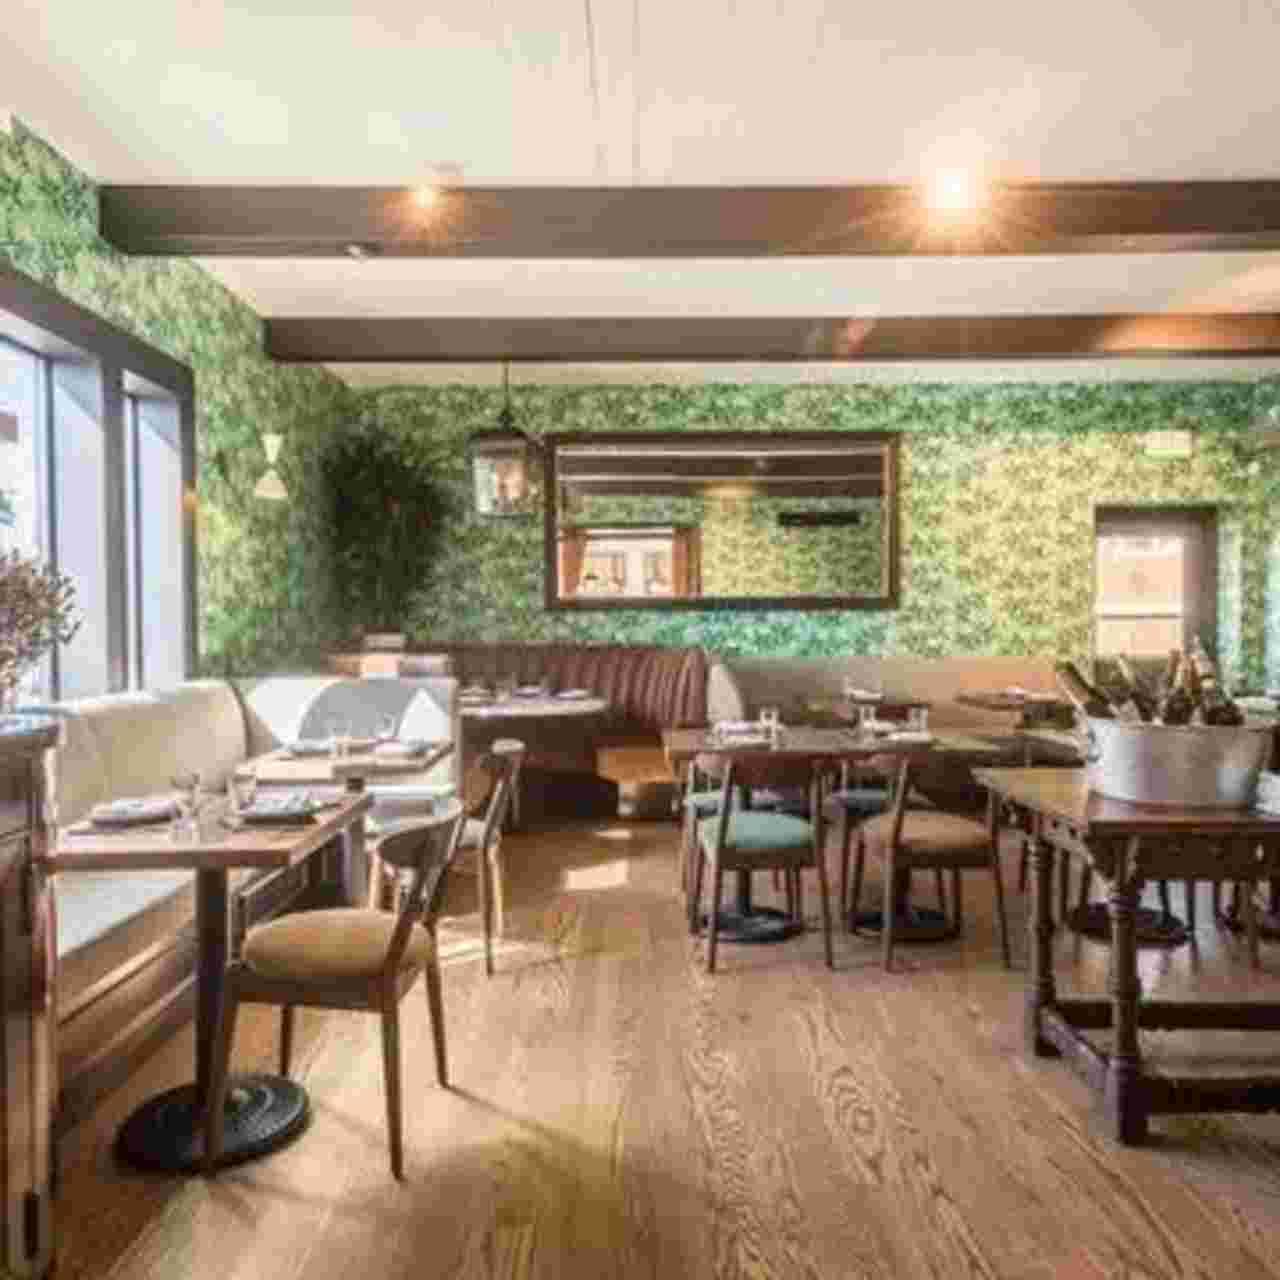 The Biggest Los Angeles Restaurant Openings of 2017